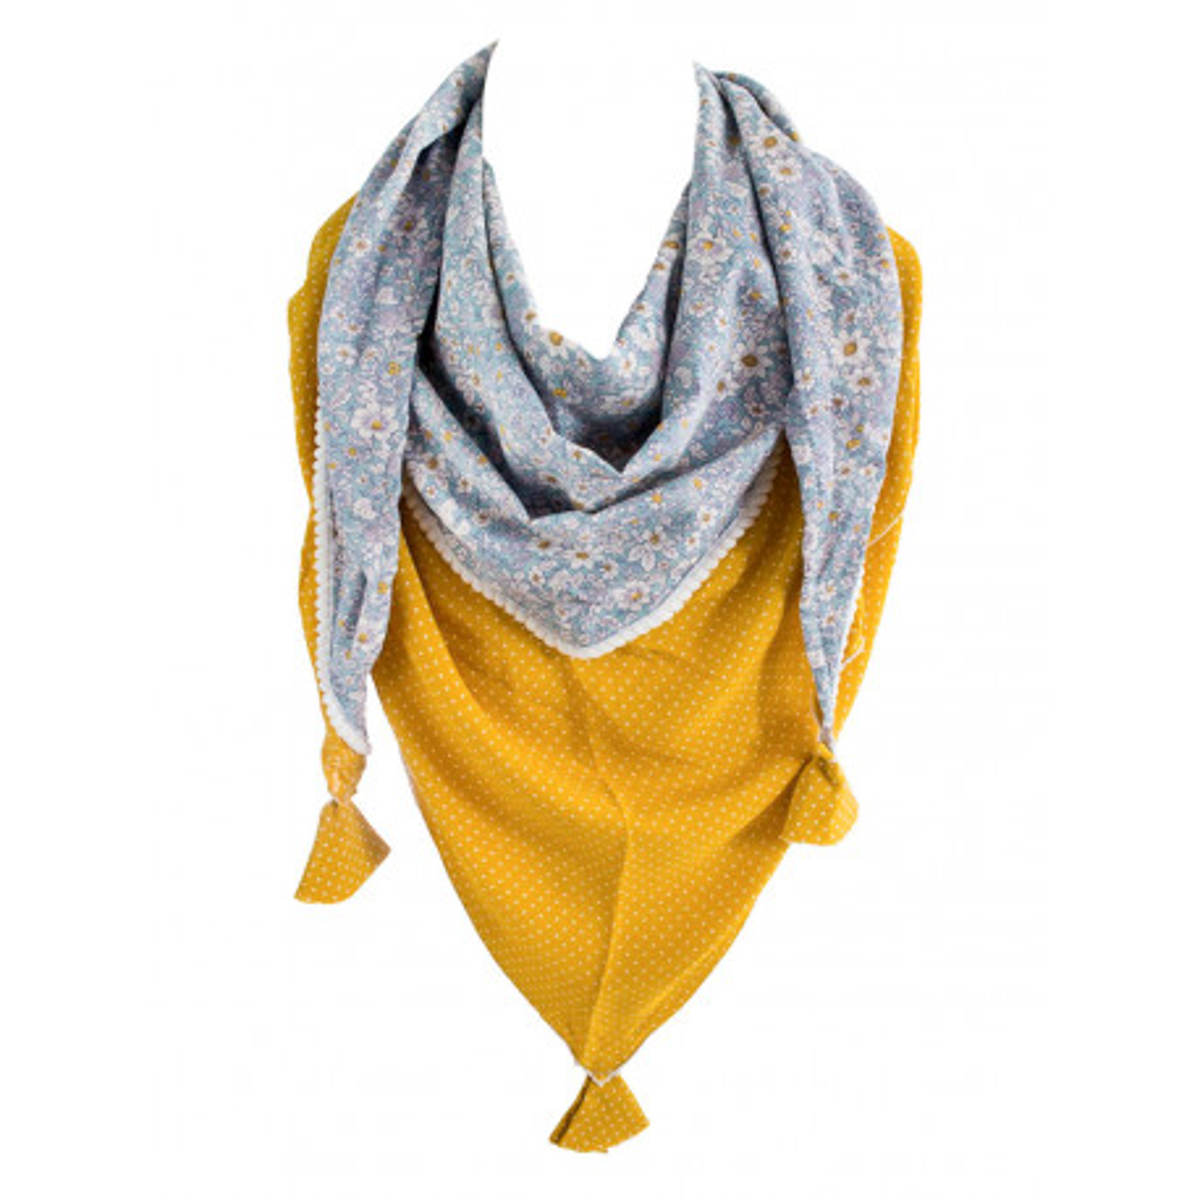 Foulard triangle jaune moutarde et fleurs bleu